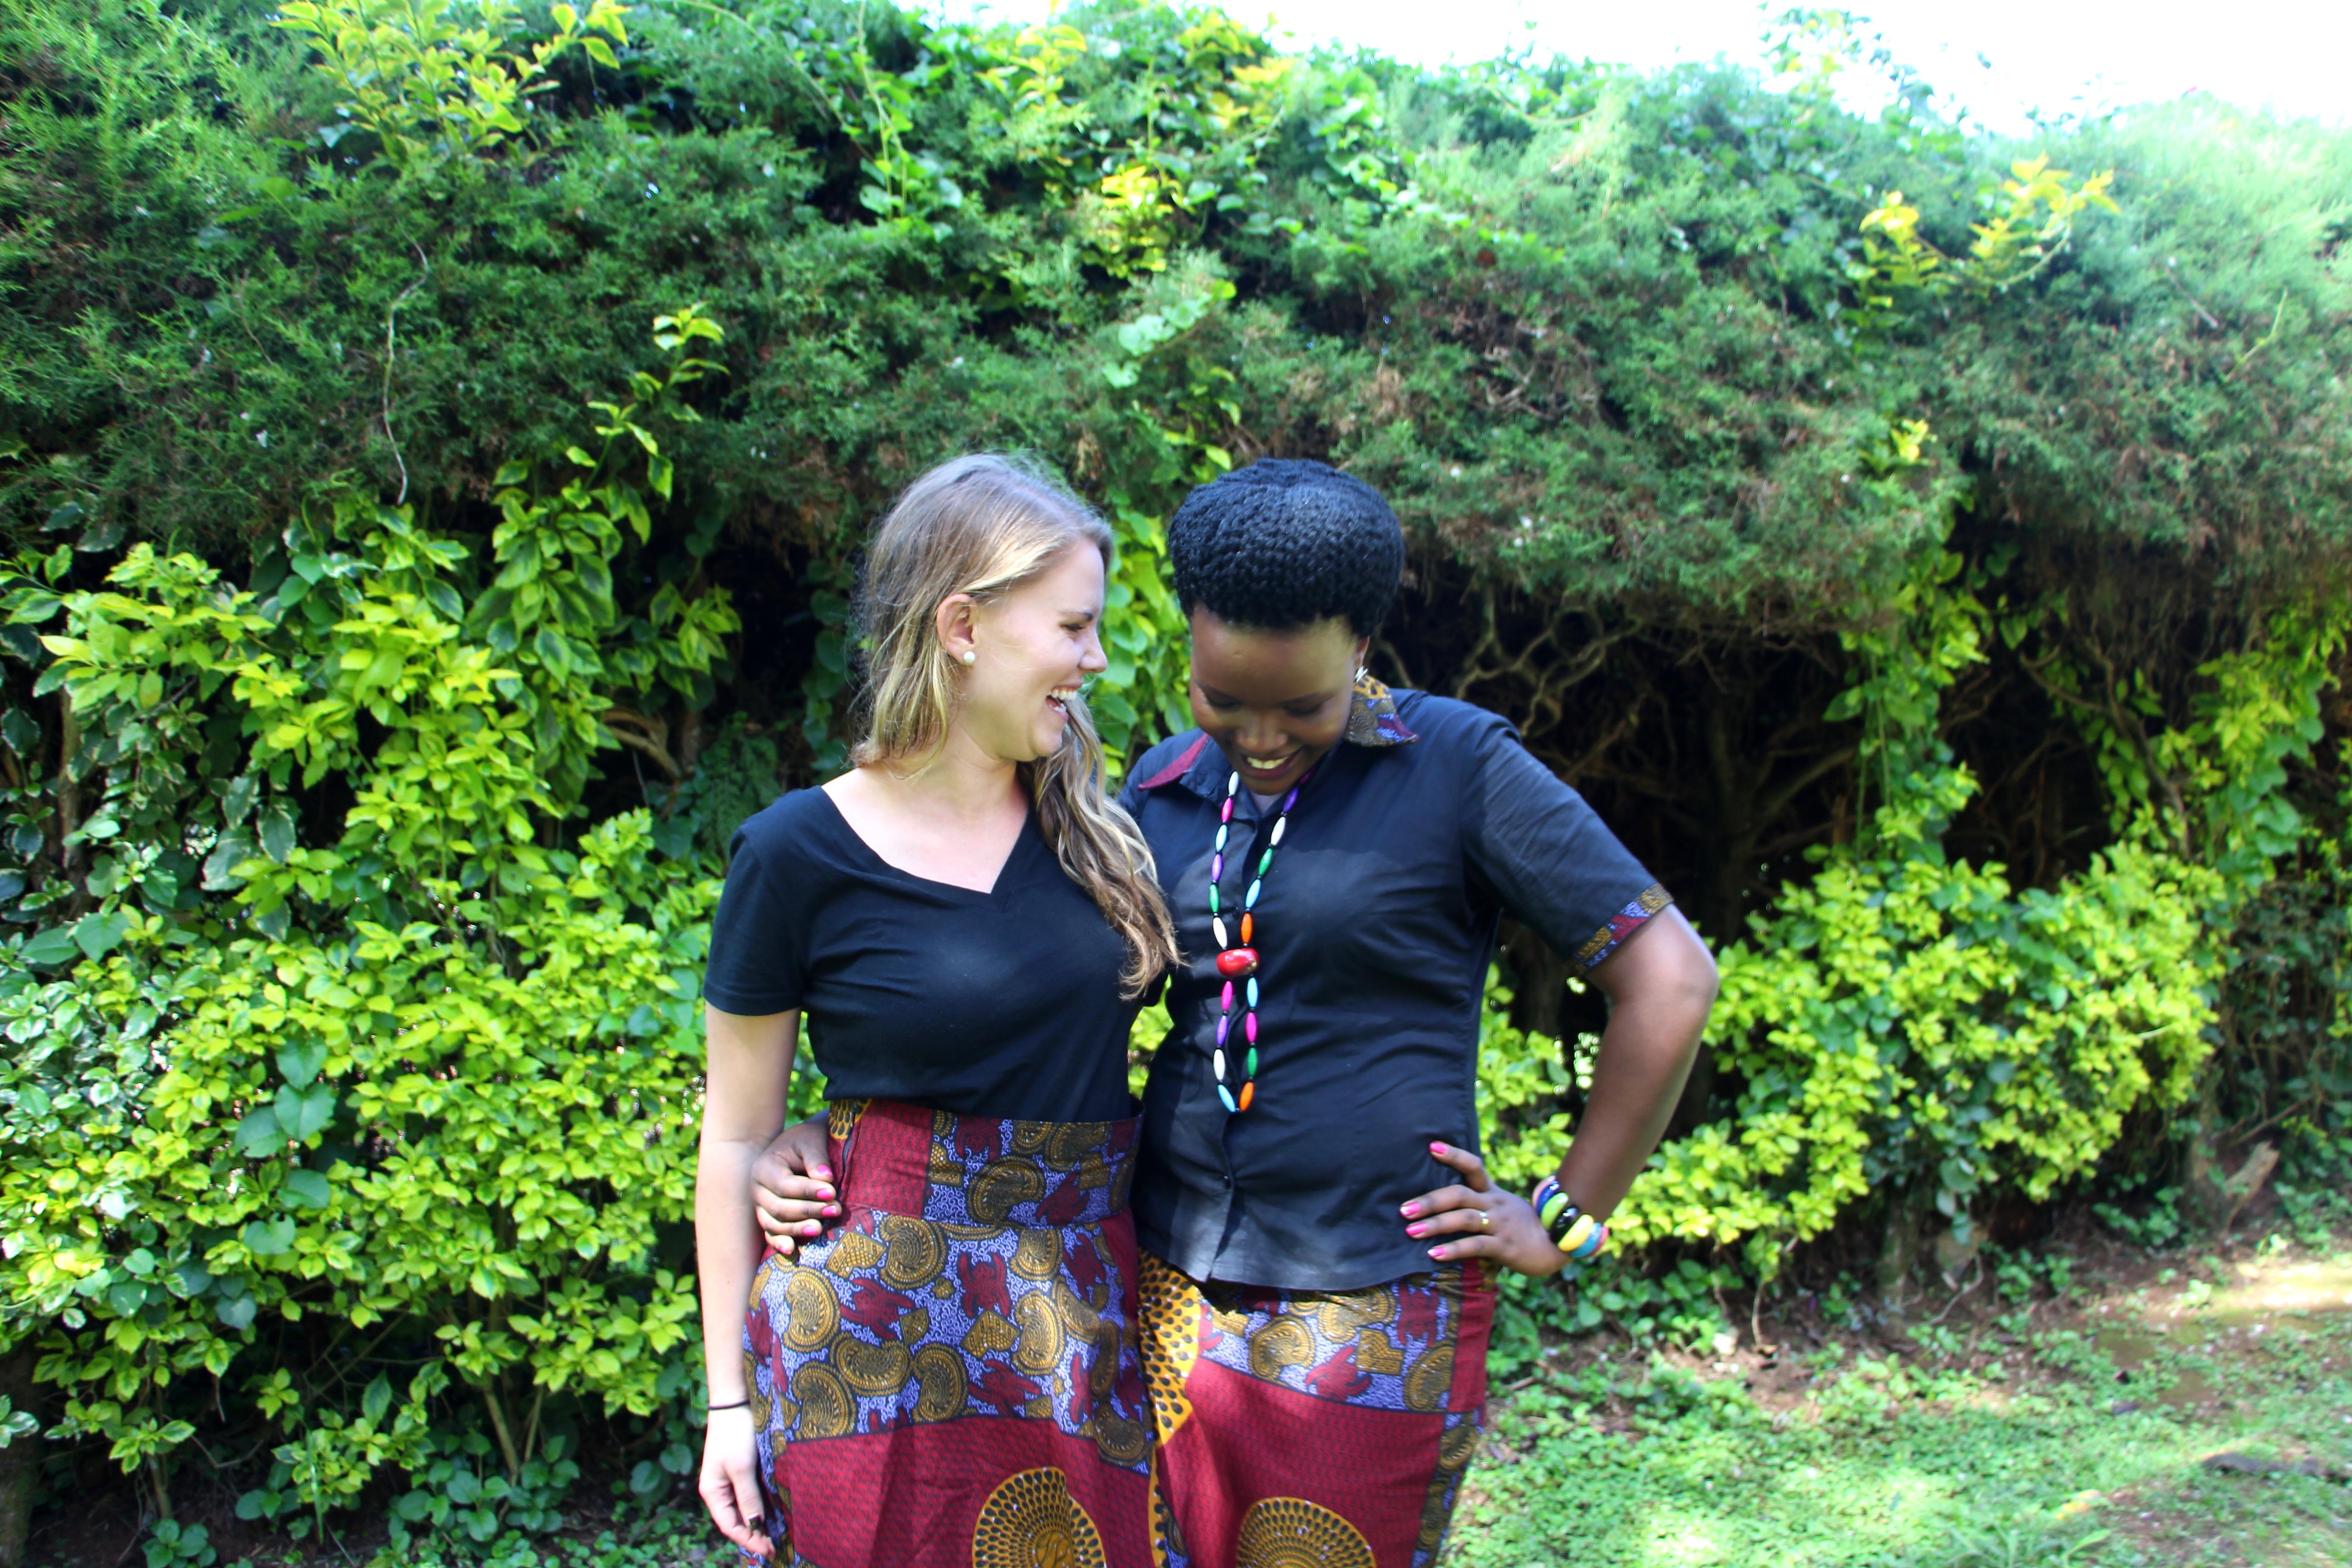 Heidi Graves andCissy Nakayimba laughing